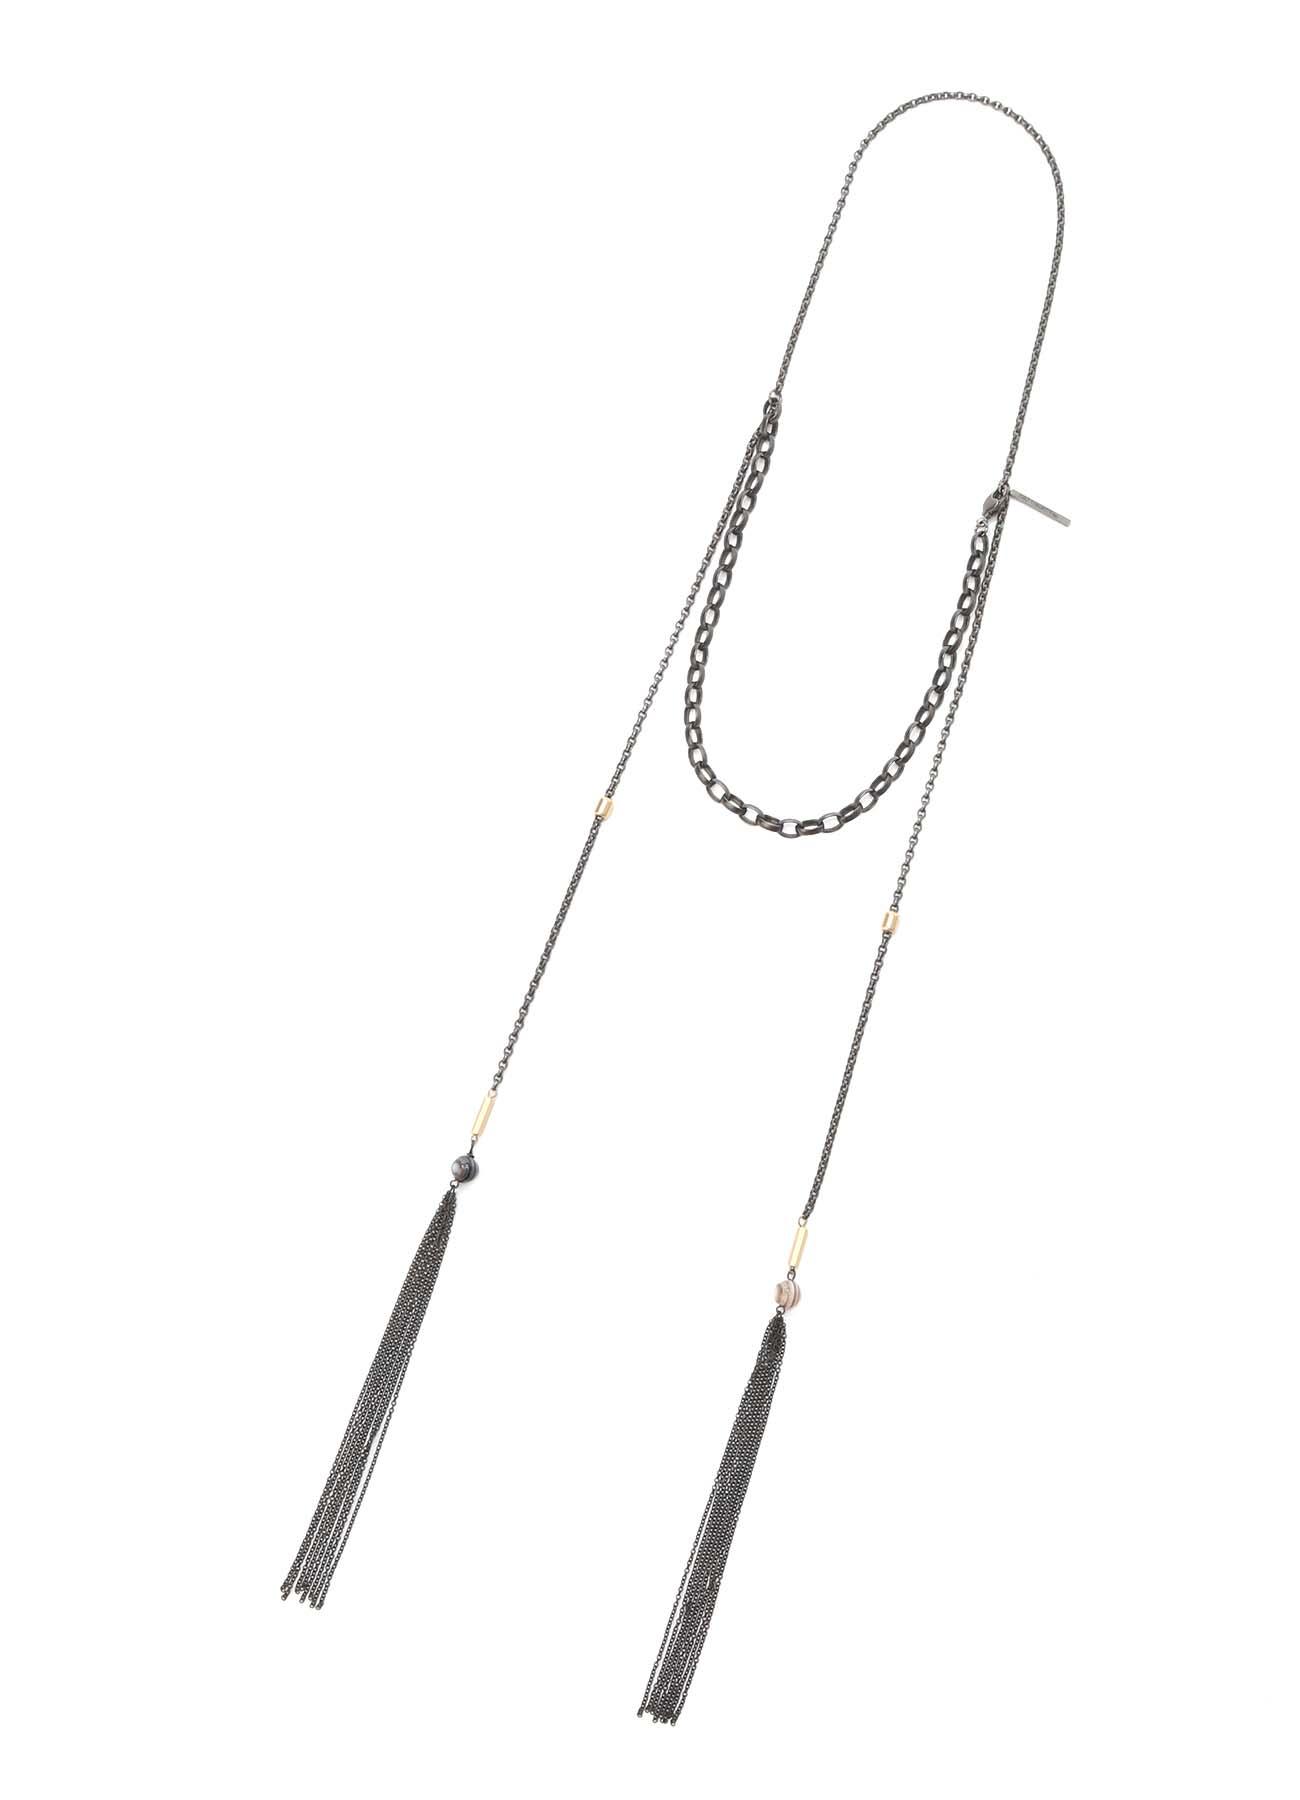 W-Tassel Chain Agate Necklace